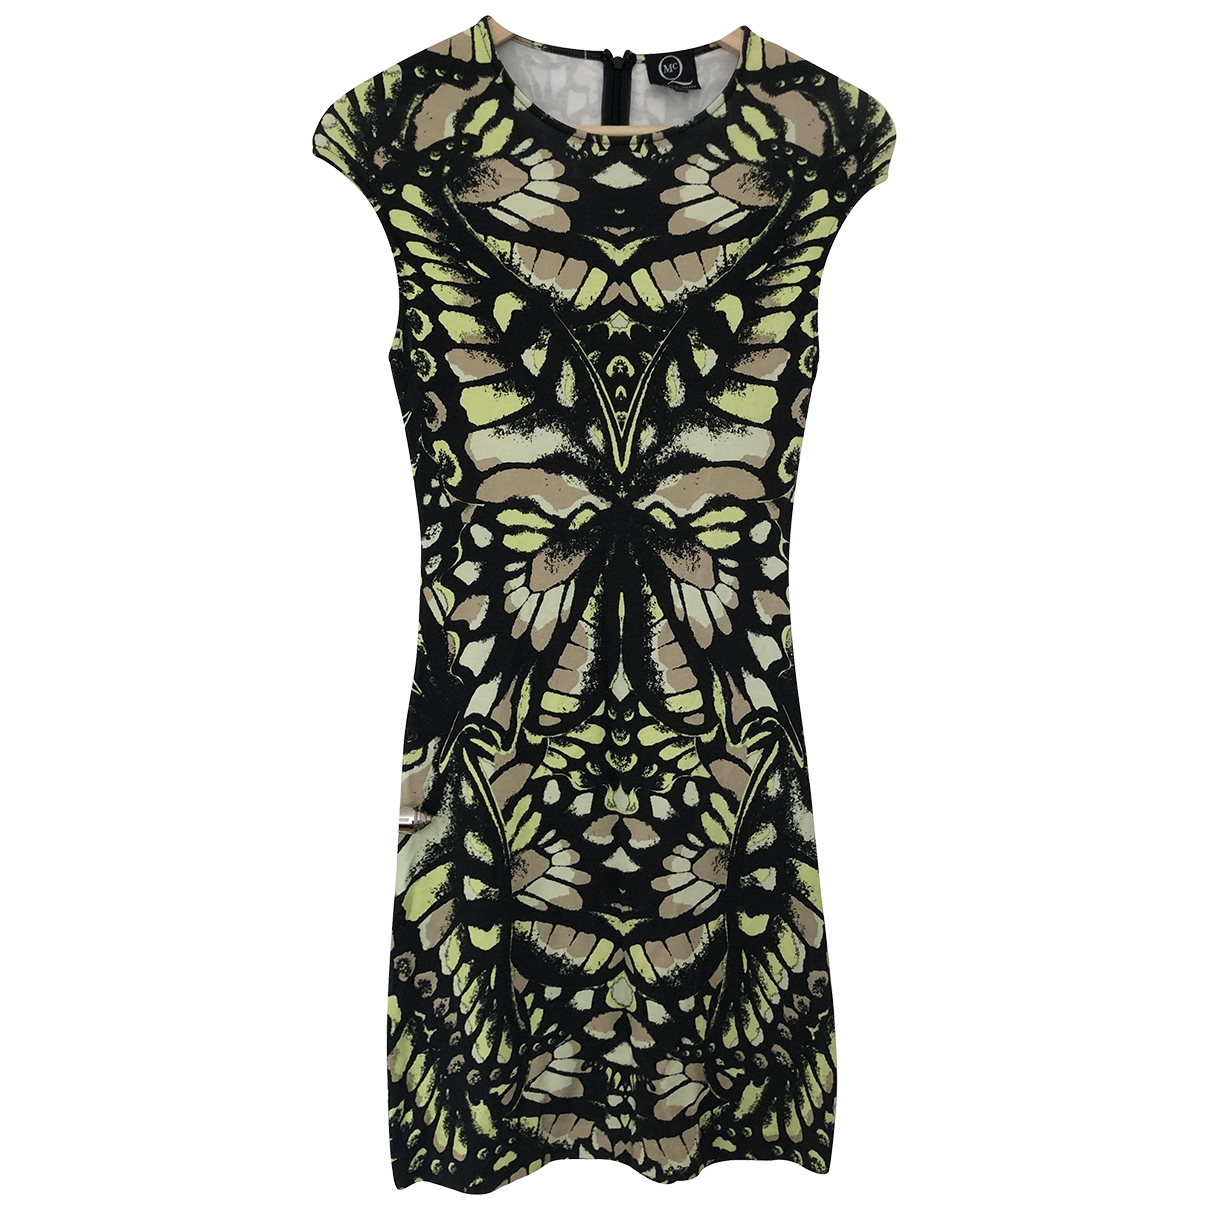 Mcq \N Multicolour Cotton - elasthane dress for Women S International